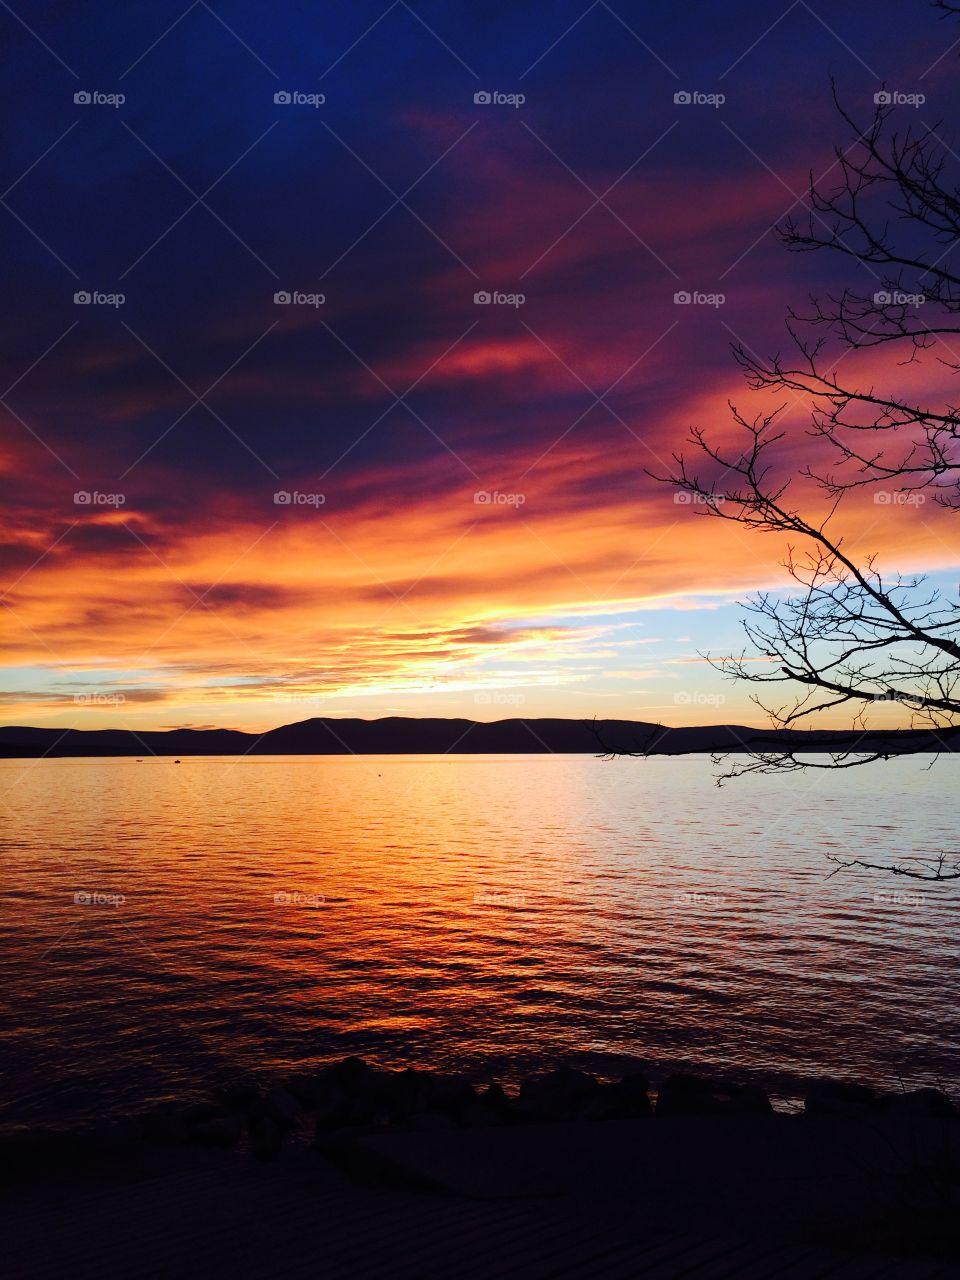 Sunset on Krk. Winter sunset on Krk Island in Croatia